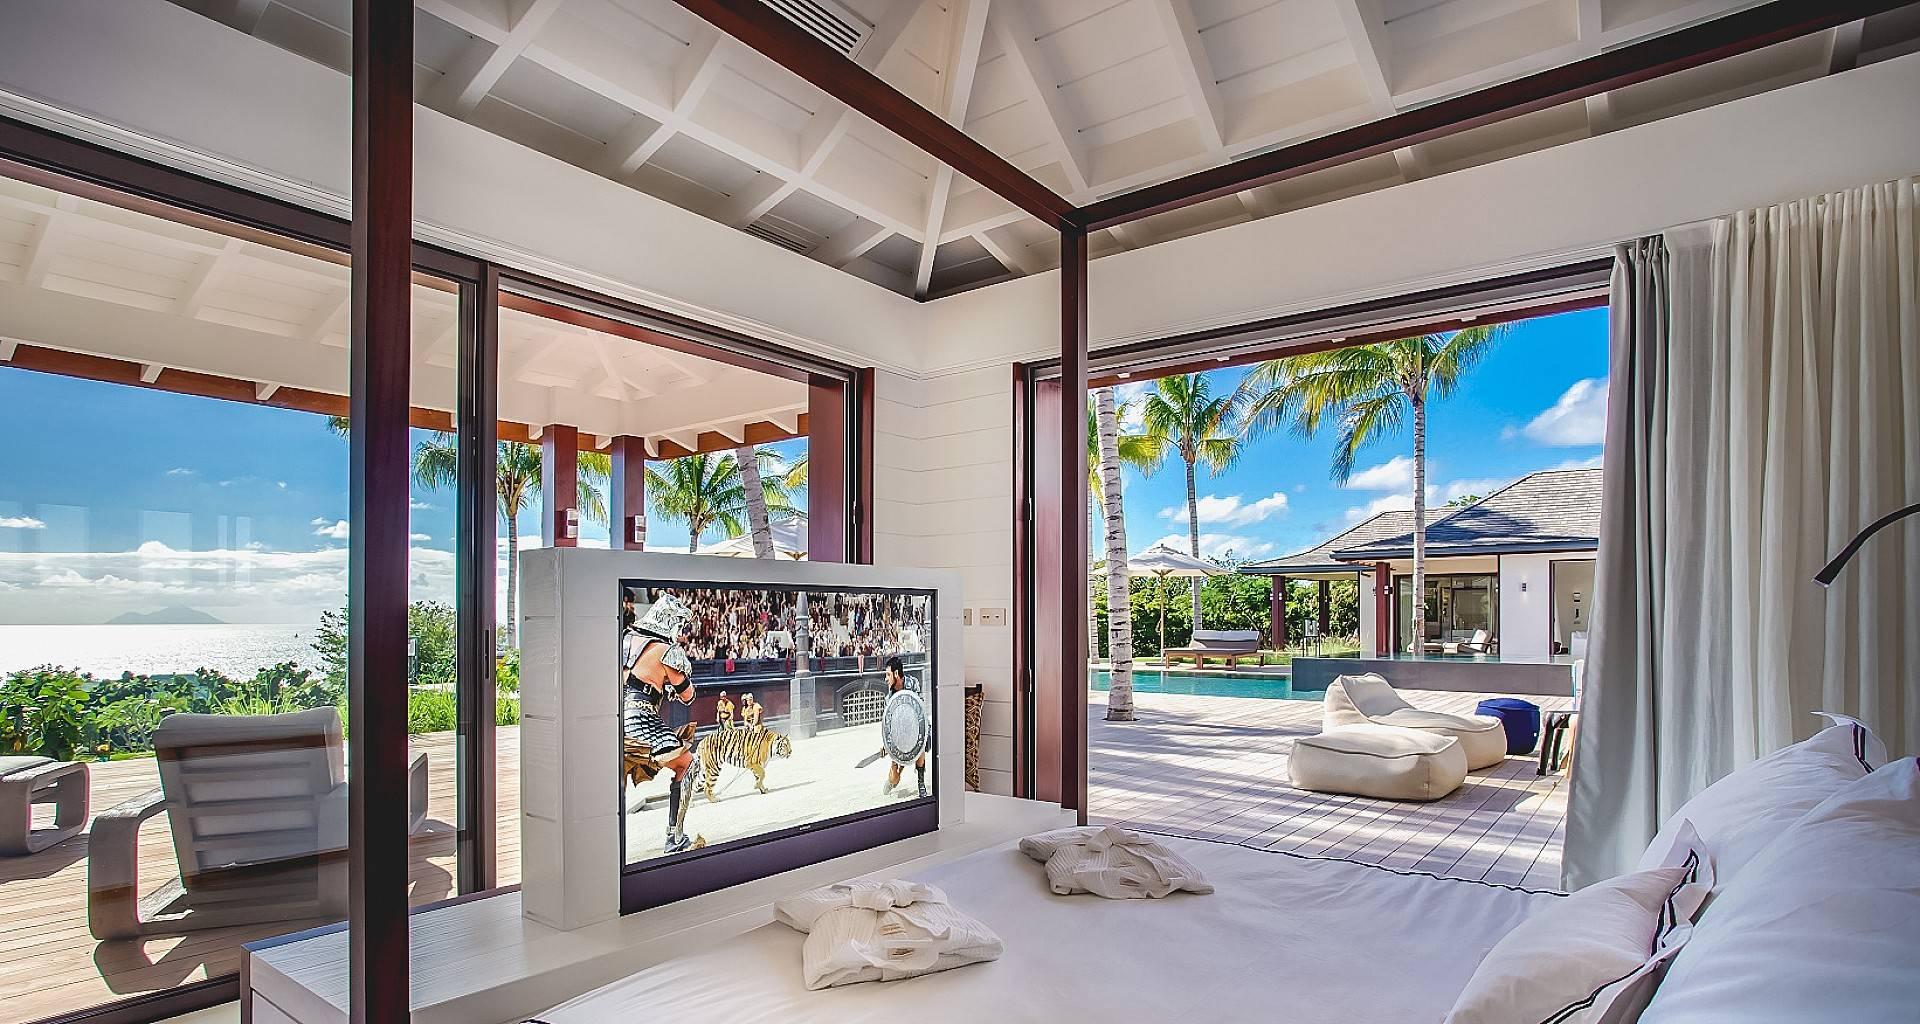 Villa Maison Blanc Bleu Bedroom 5